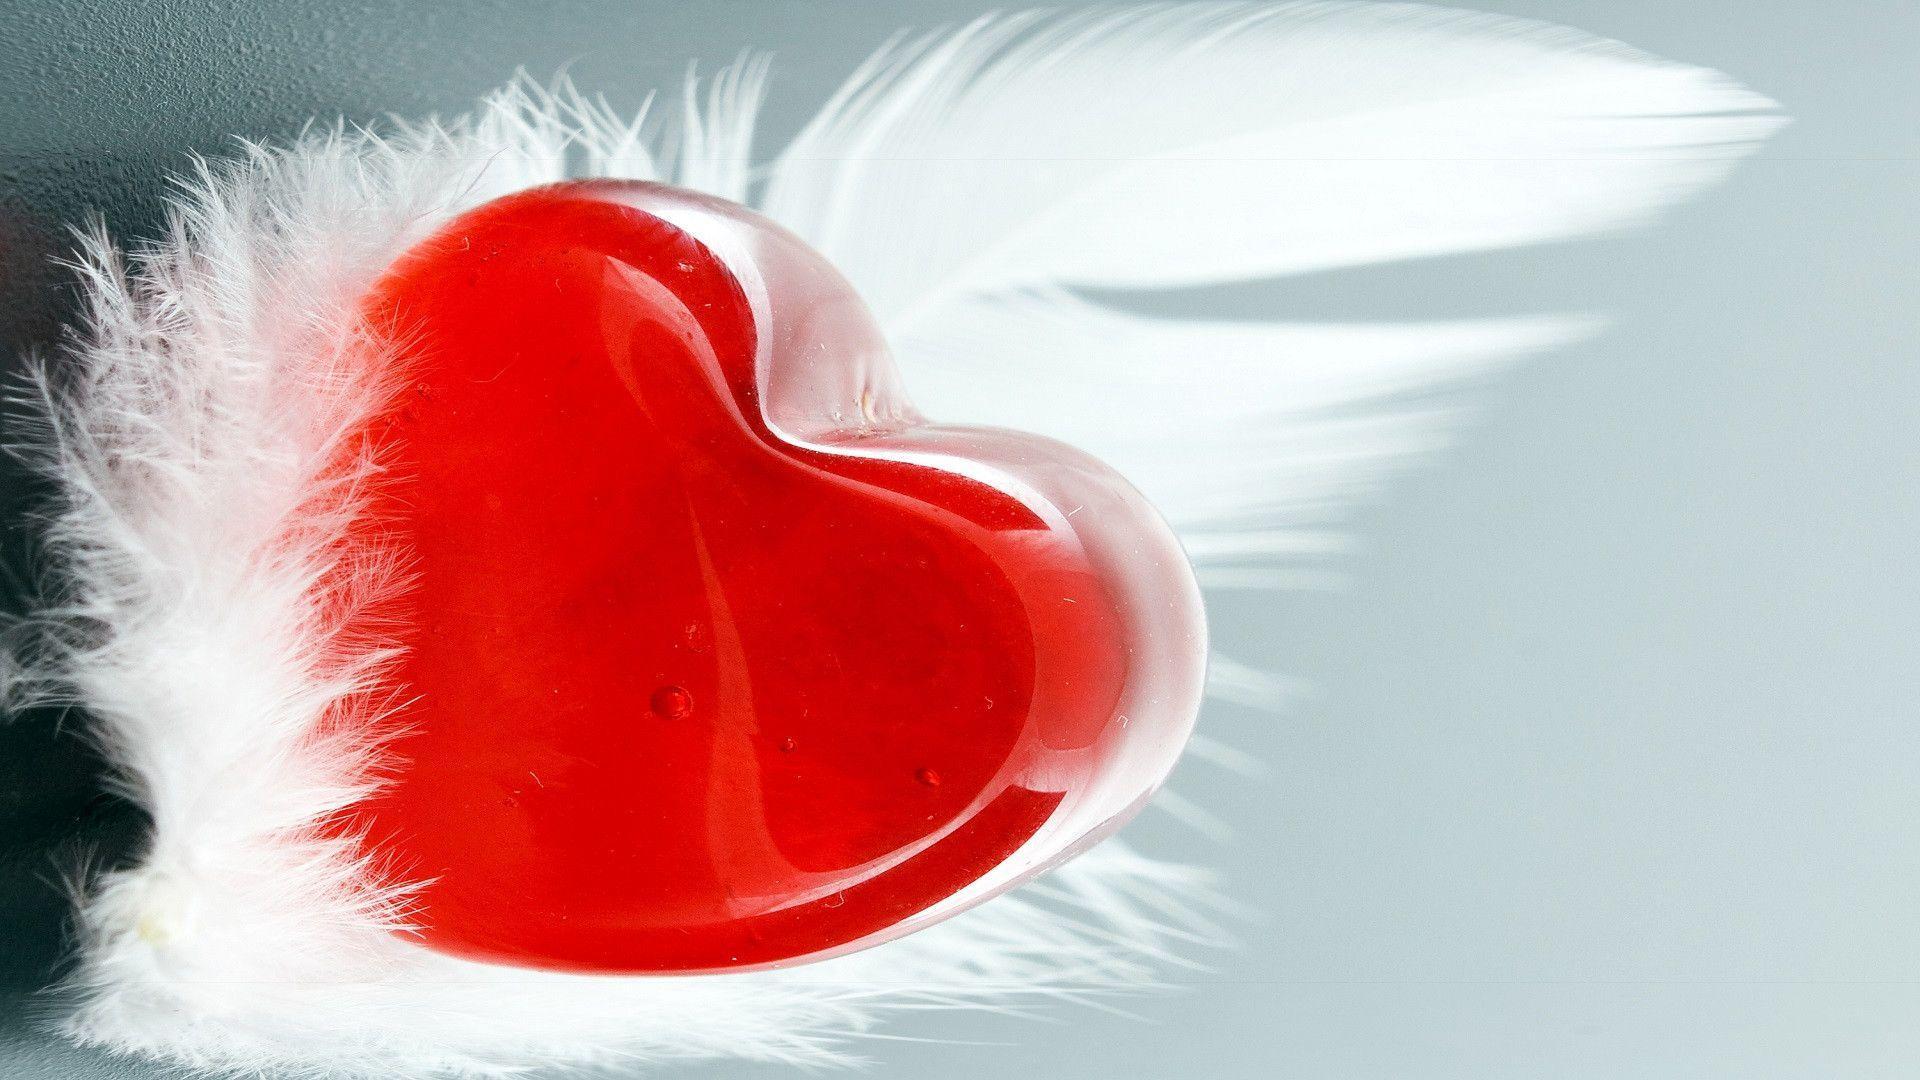 Cute Heart Wallpapers for Desktop